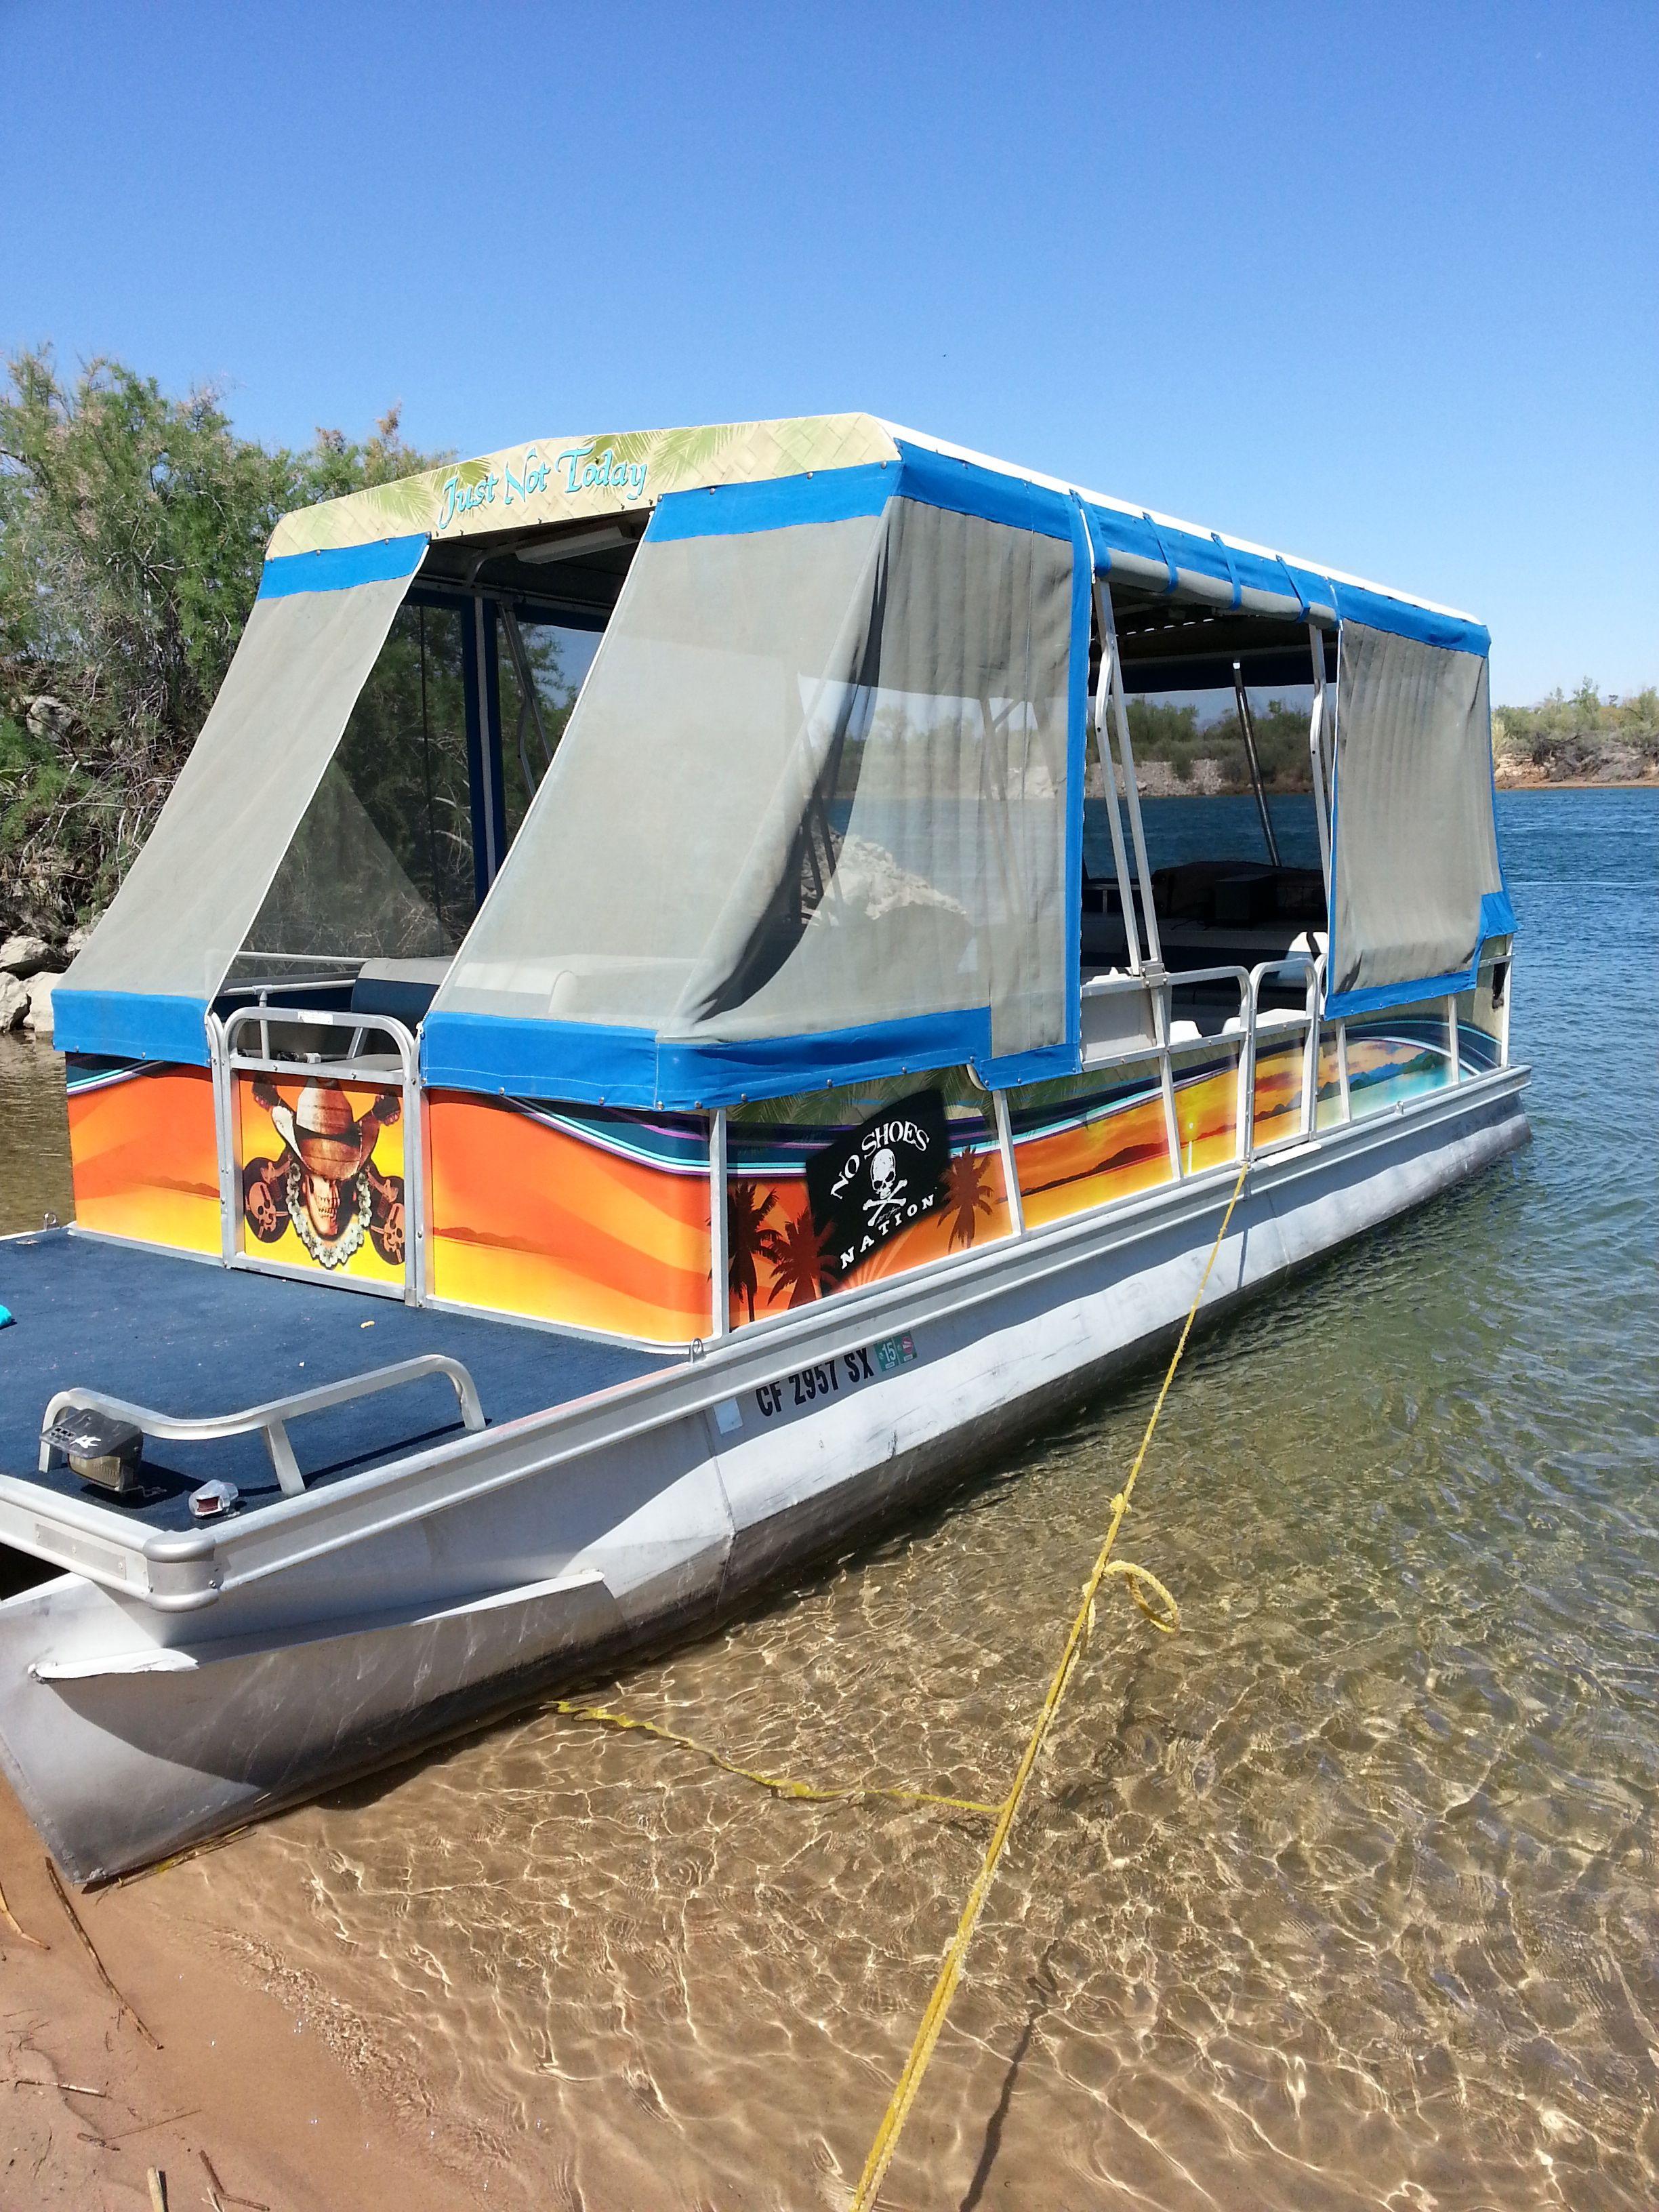 Kenny Chesney Themed Ink Vinyl Wrap Skin On A Pontoon Boat